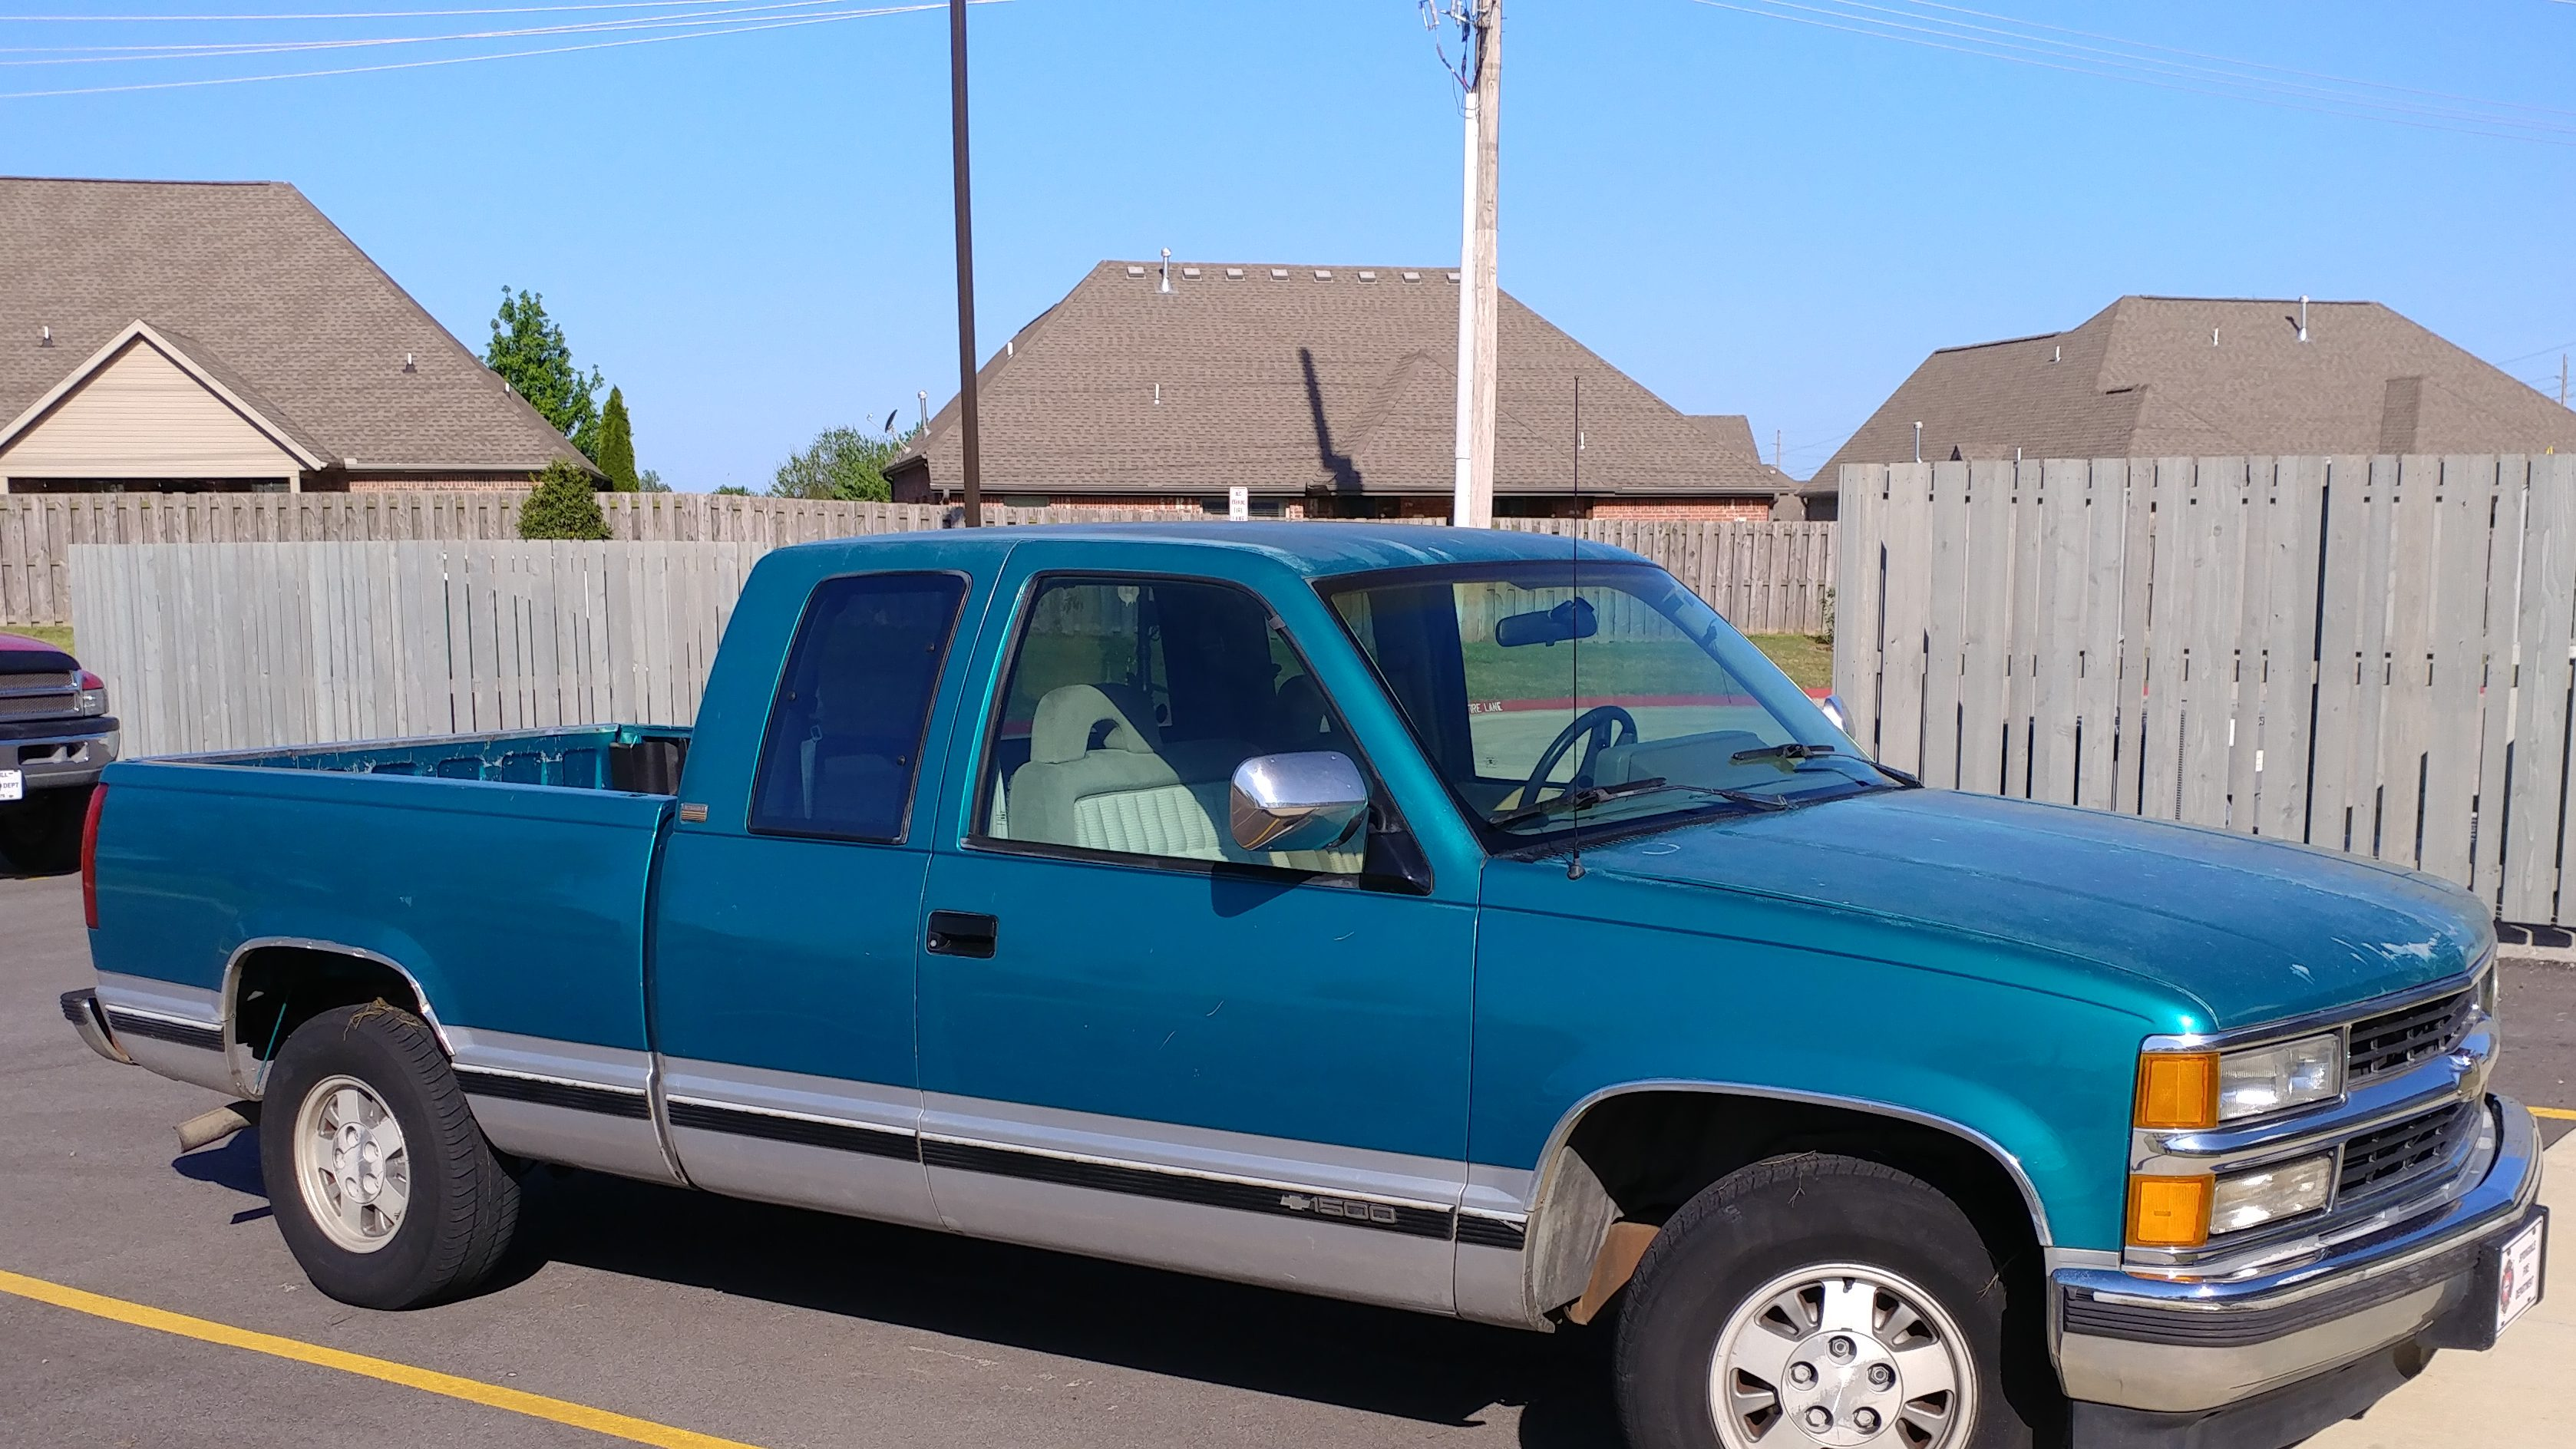 Randy's Truck